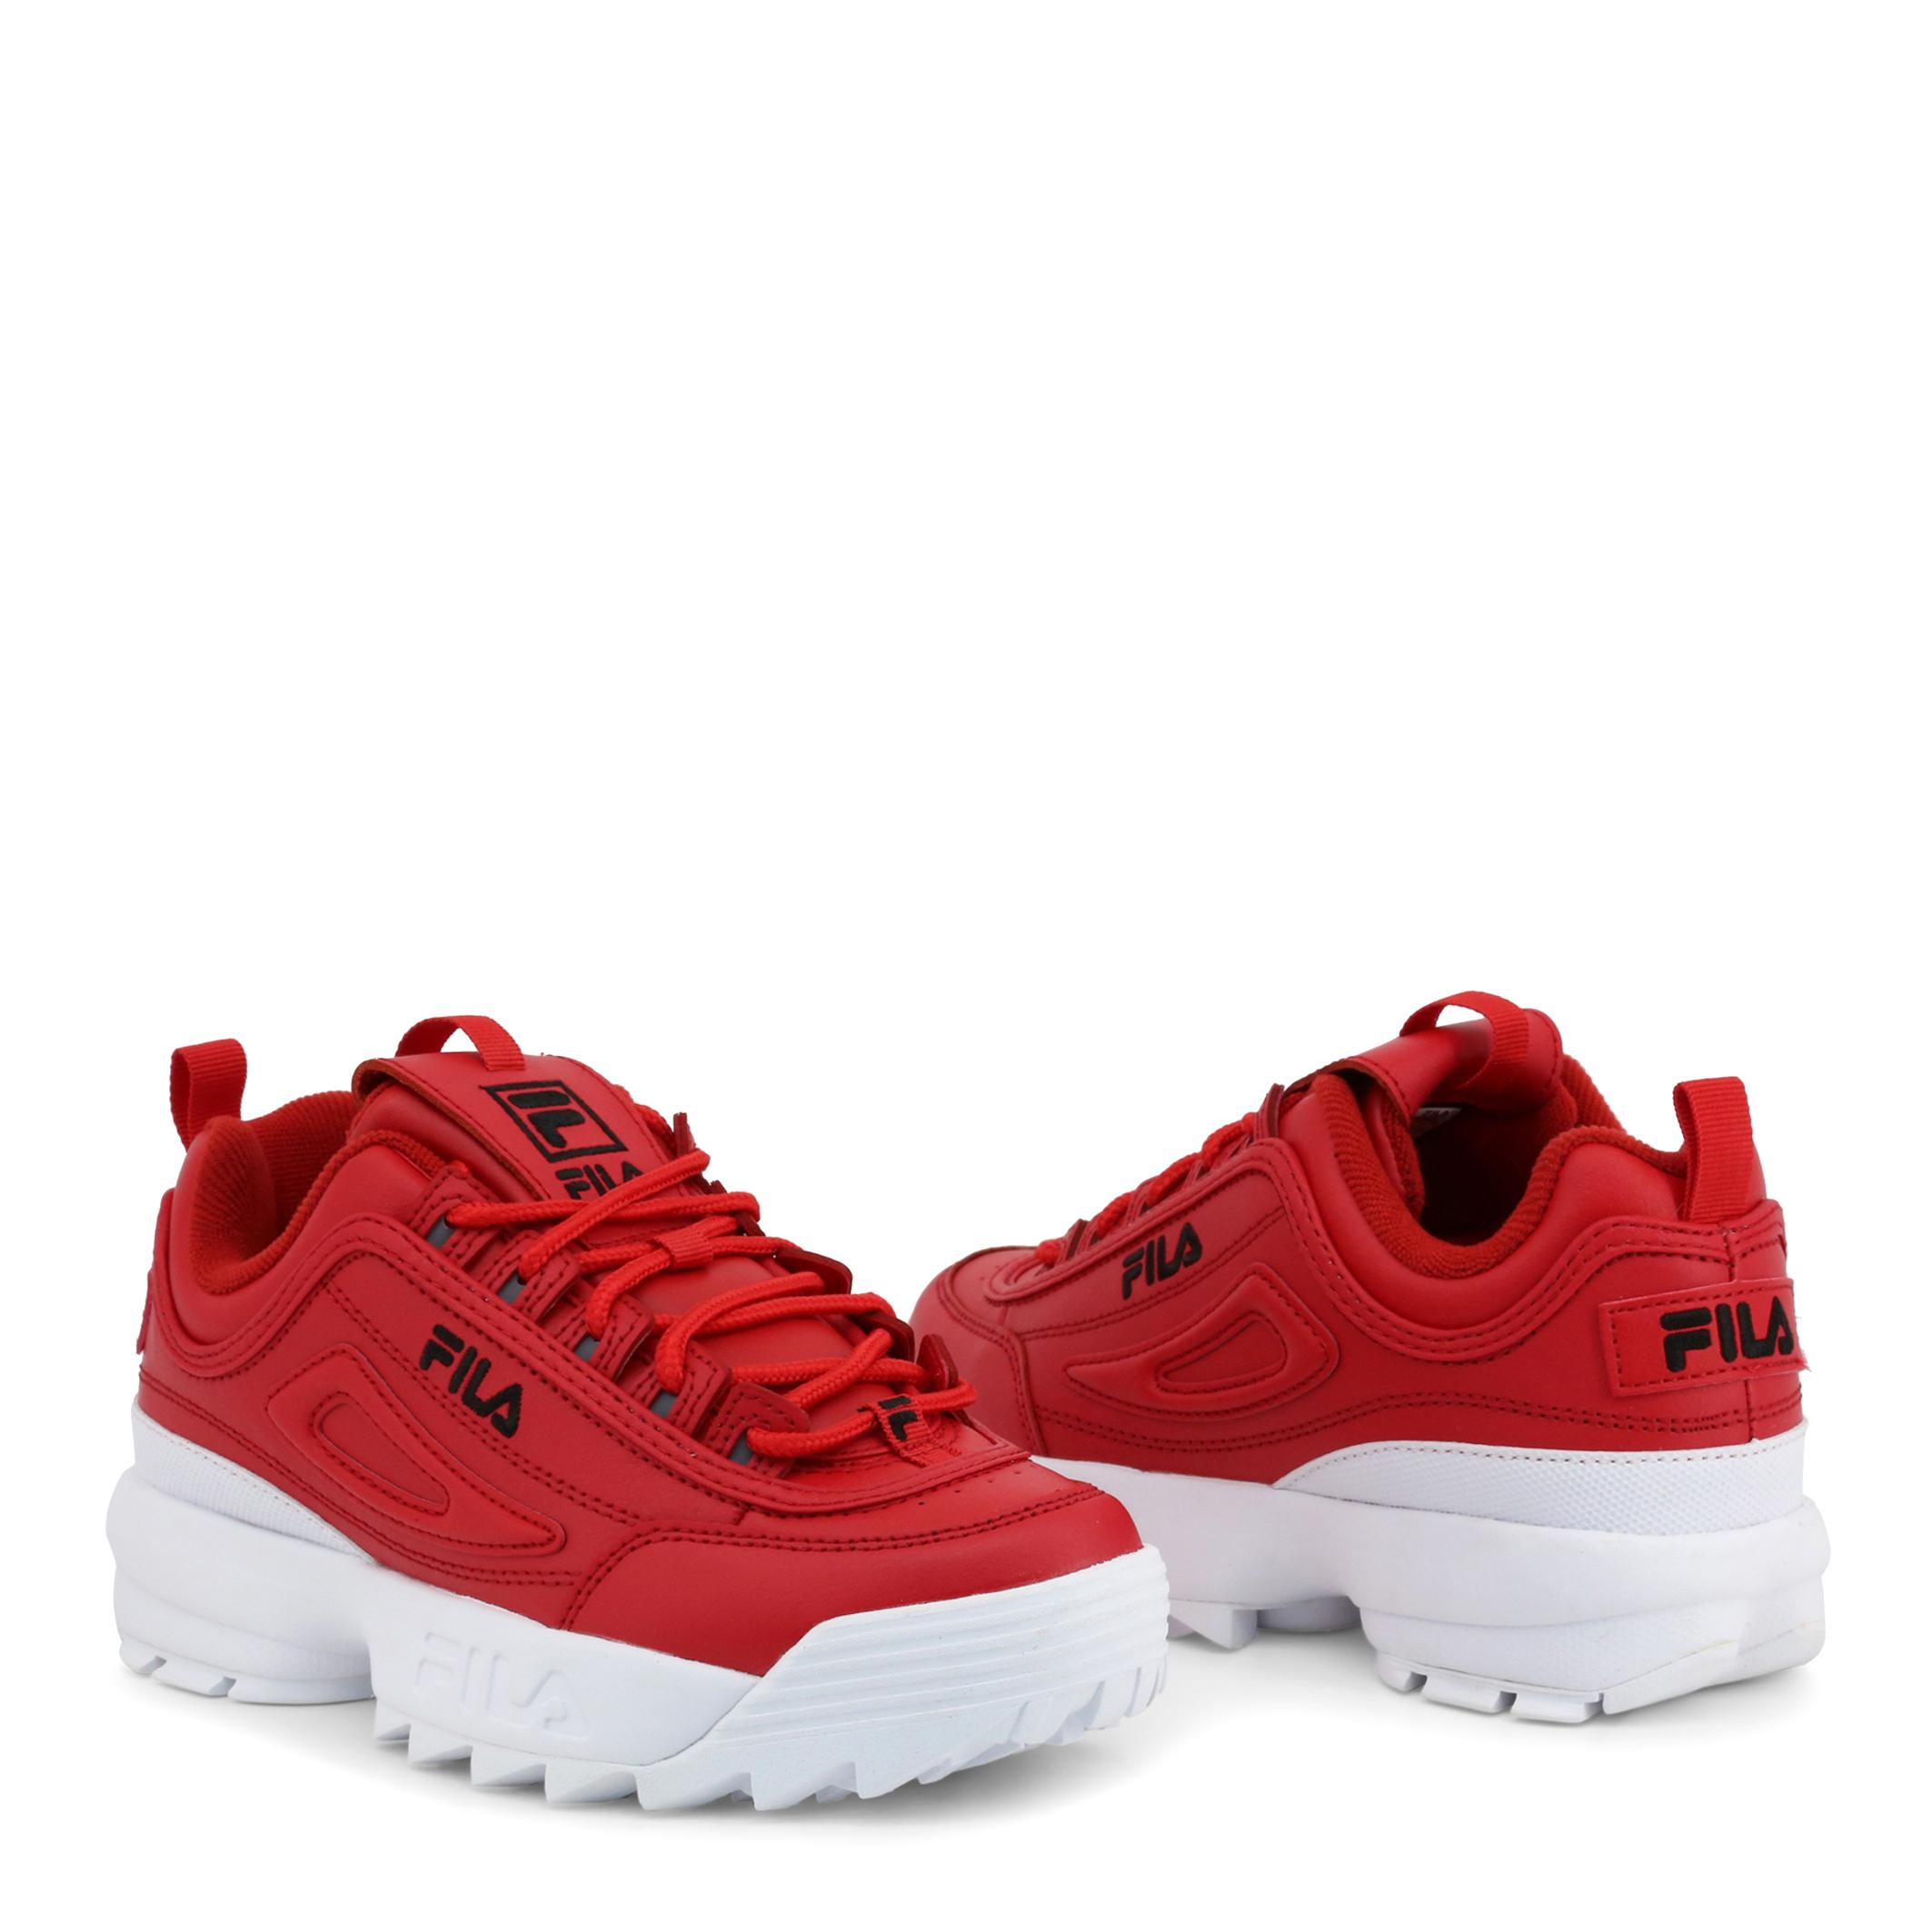 Baskets / Sneakers  Fila DISRUPTOR-2-PREMIUM_5FM00540 red